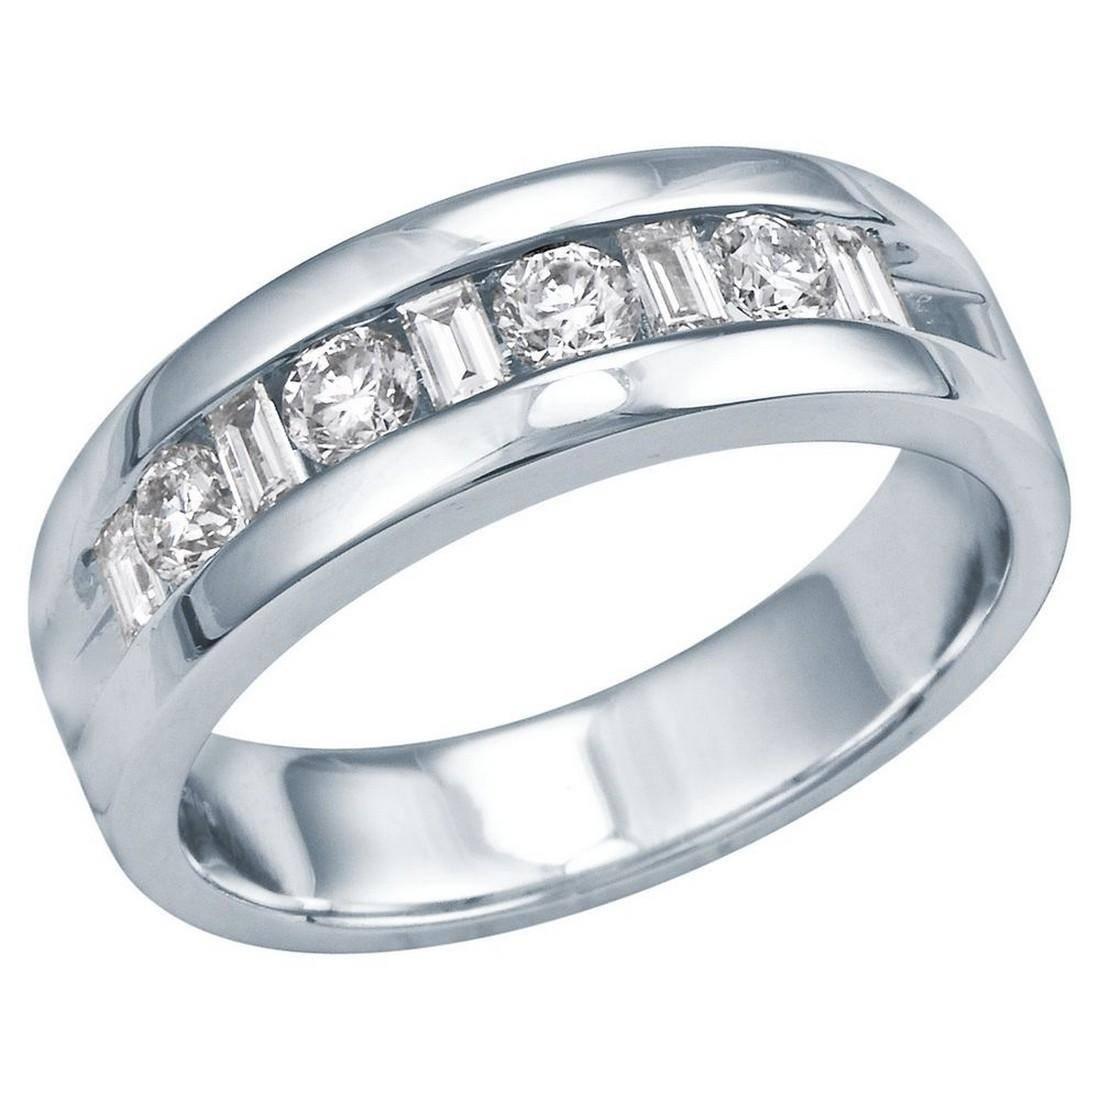 Zales Engagement Rings For Men 1 – Ifec Ci Throughout Zales Engagement Rings For Men (View 5 of 15)